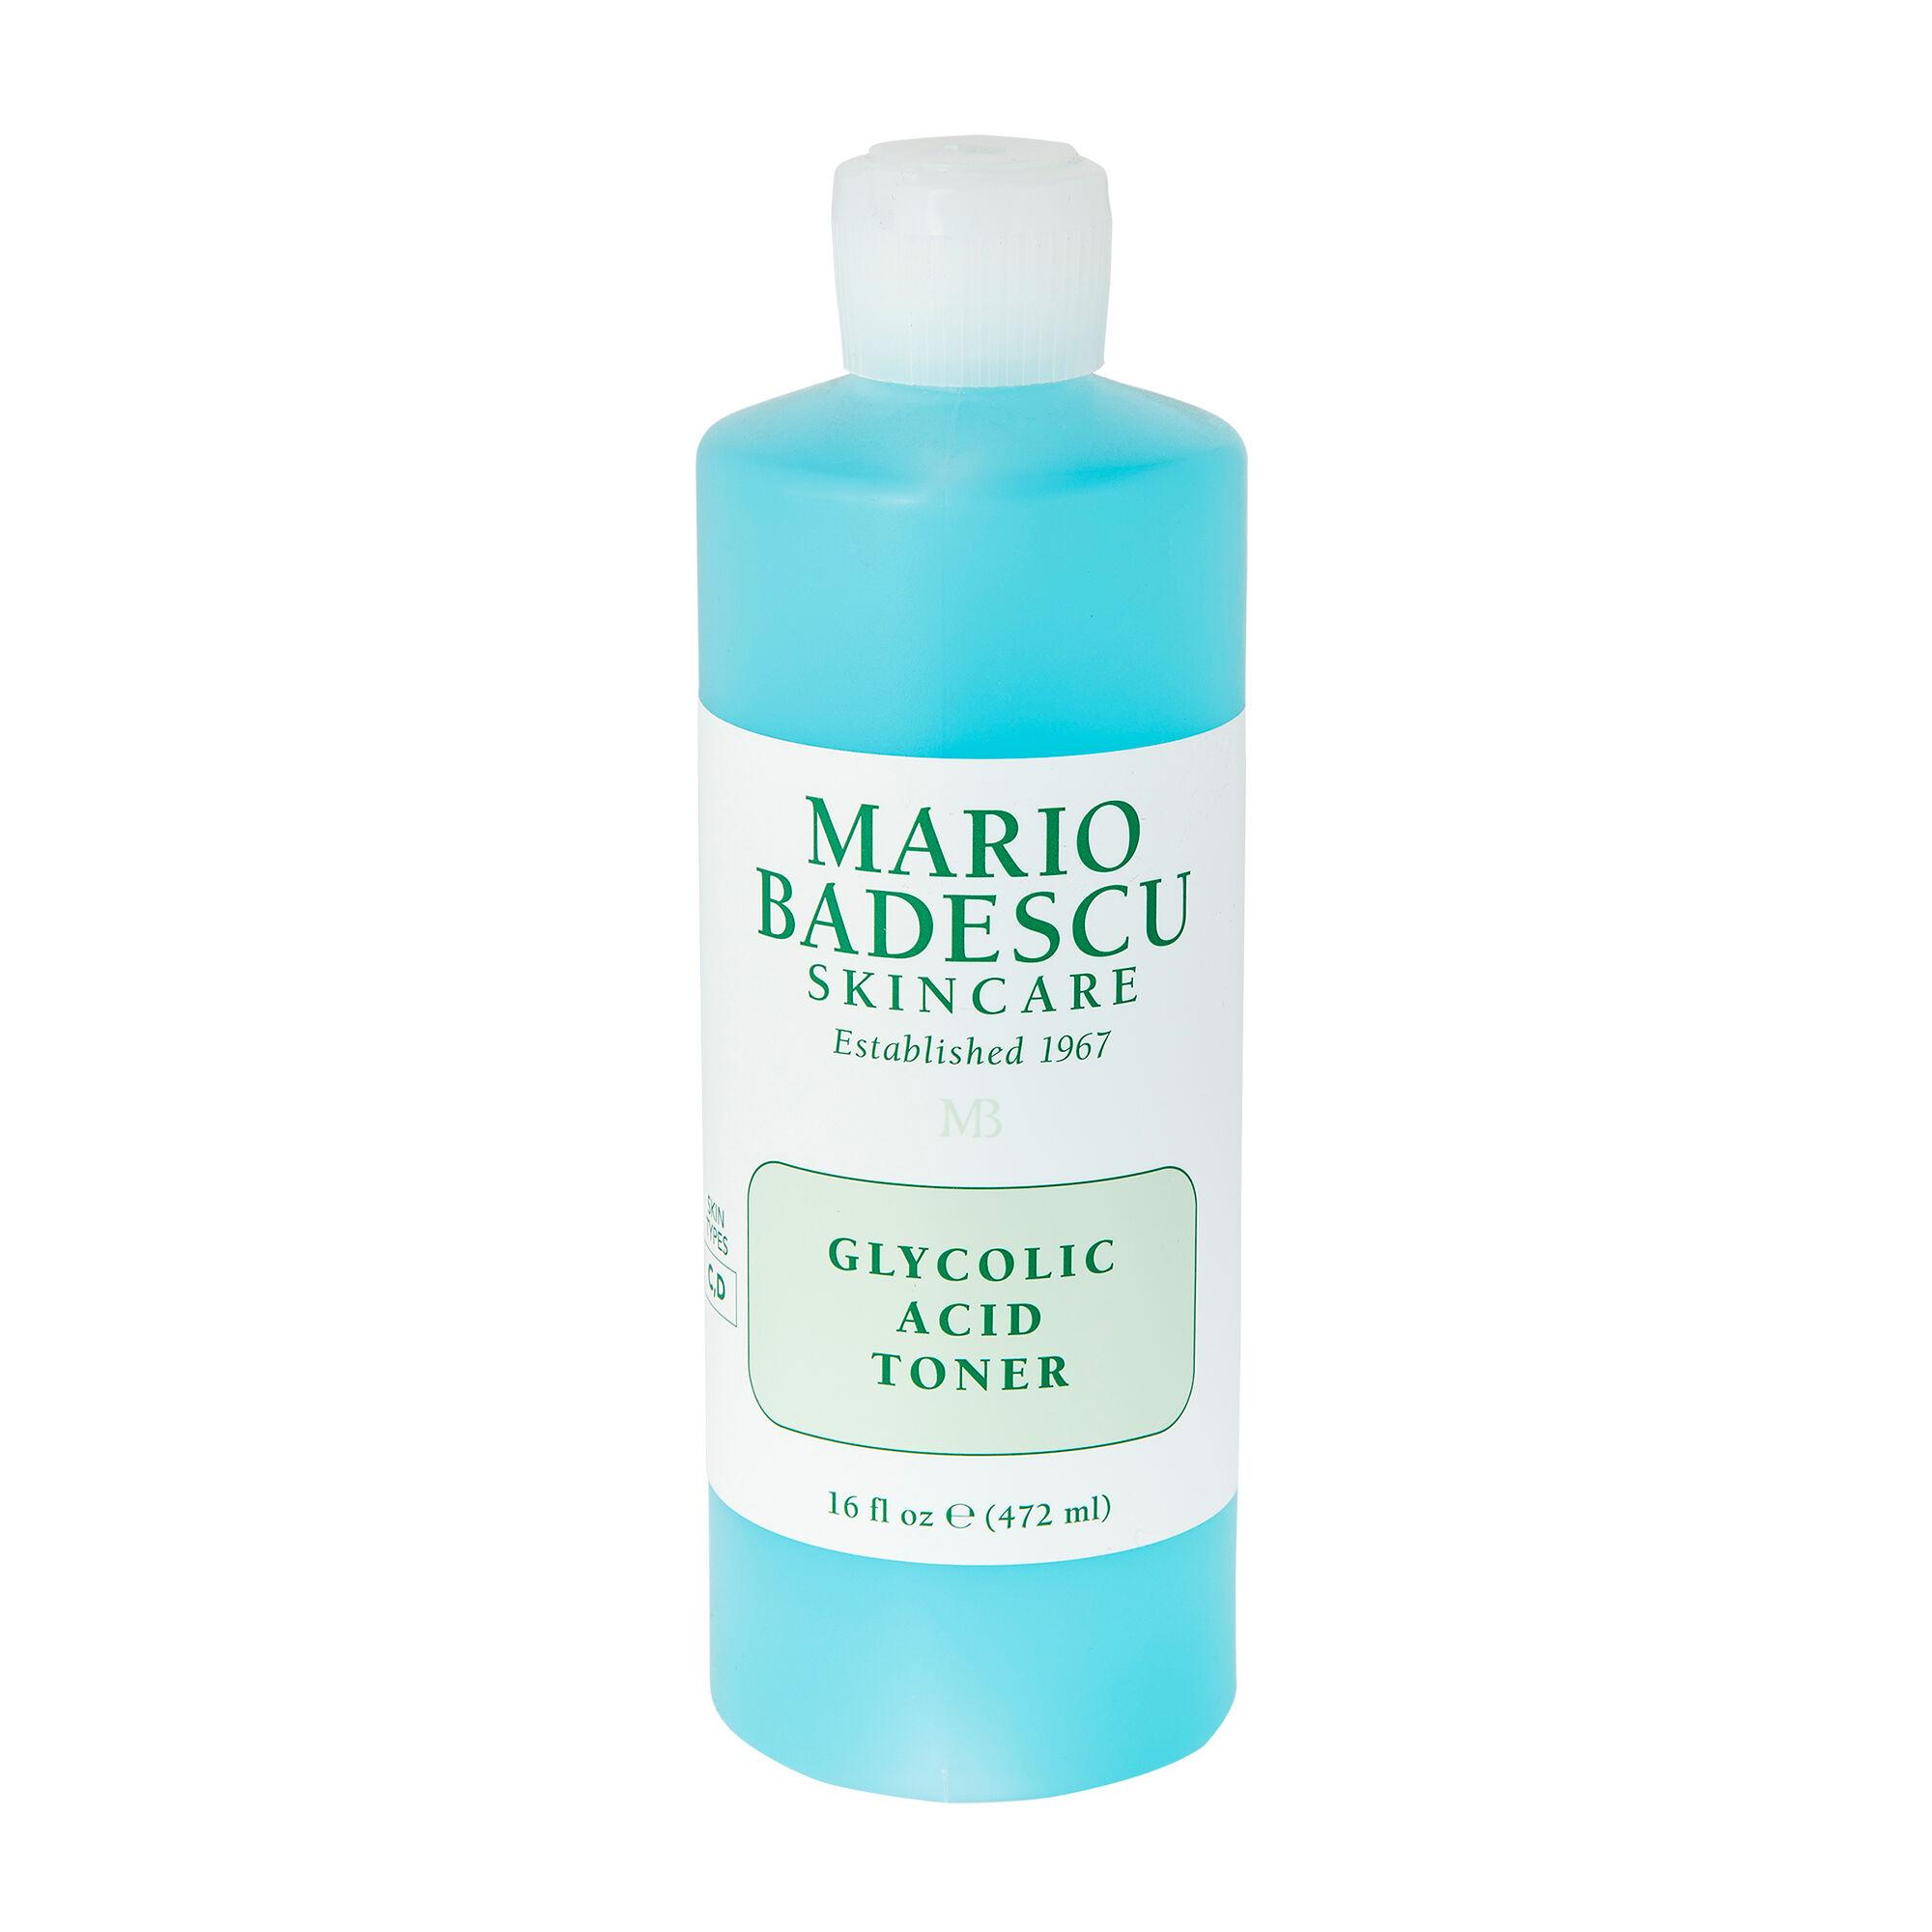 Mario Badescu Lotion tonique lacide glycolique Glycolic Acid Toner 472ml